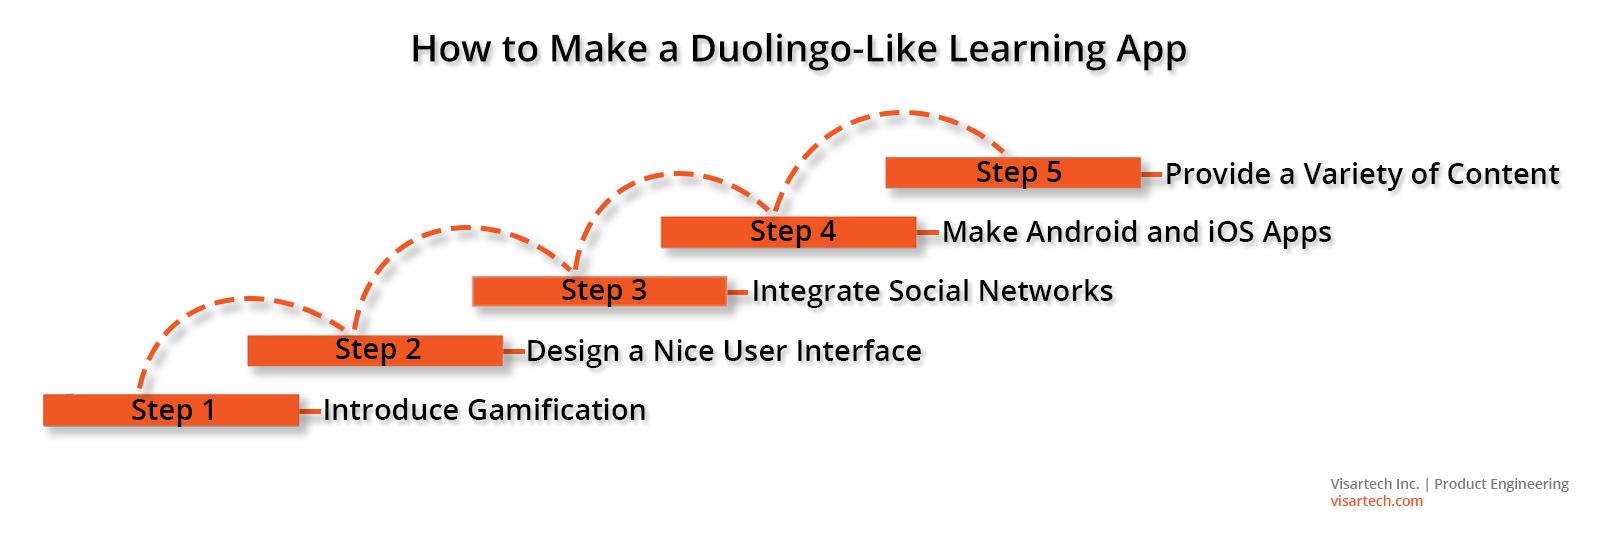 5 Clues on How to Create a Successful Learning App Like Duolingo - Visartech Blog